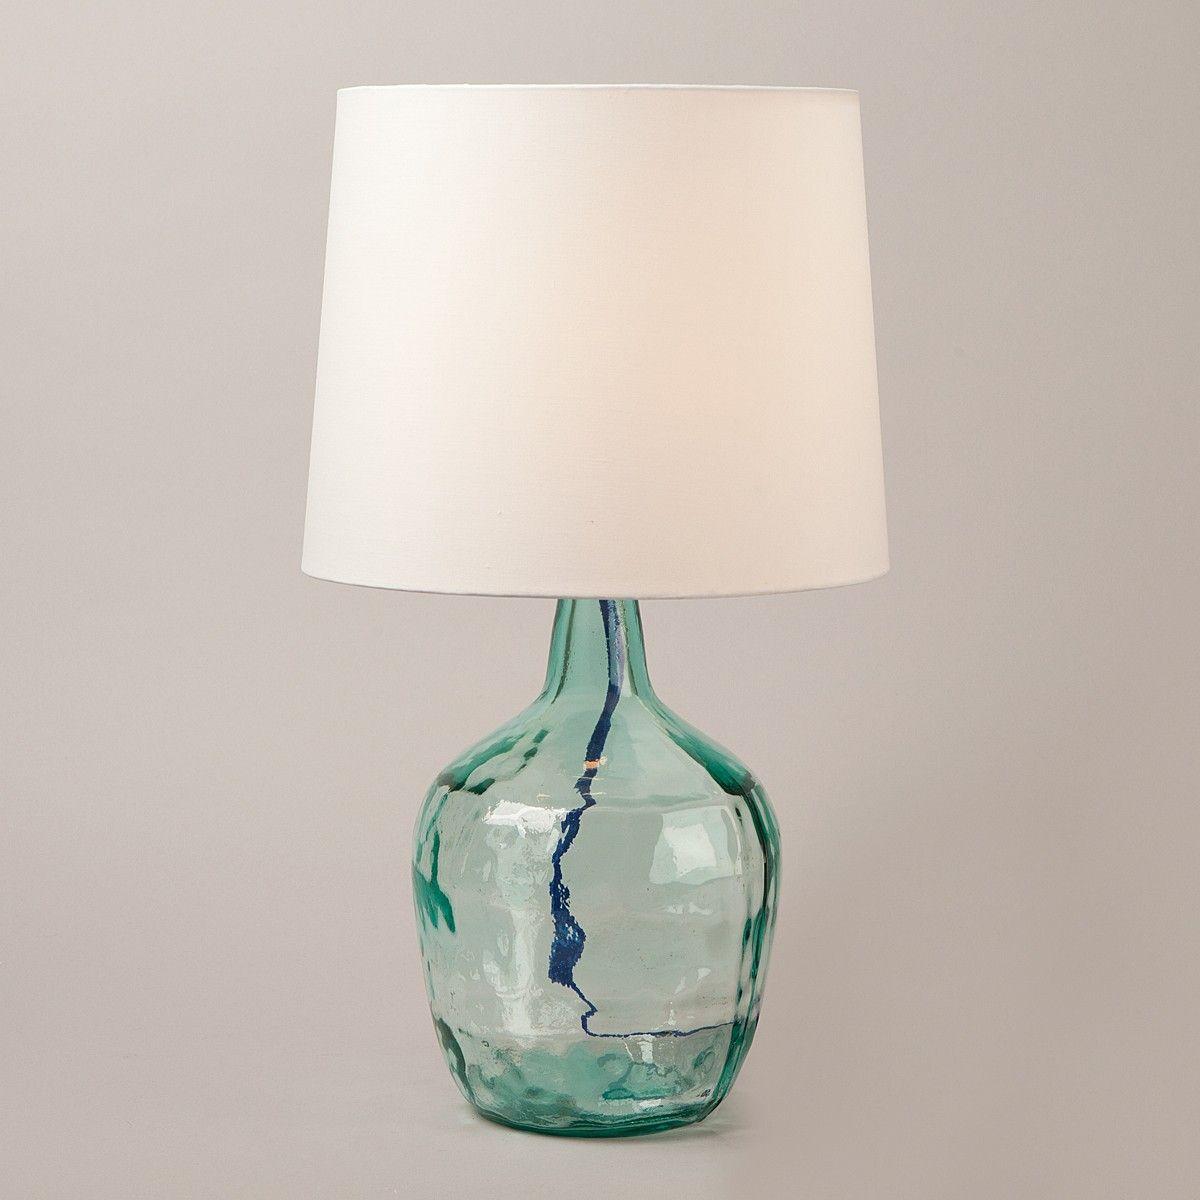 Lamp Buy: Wicker Emporium Wish List